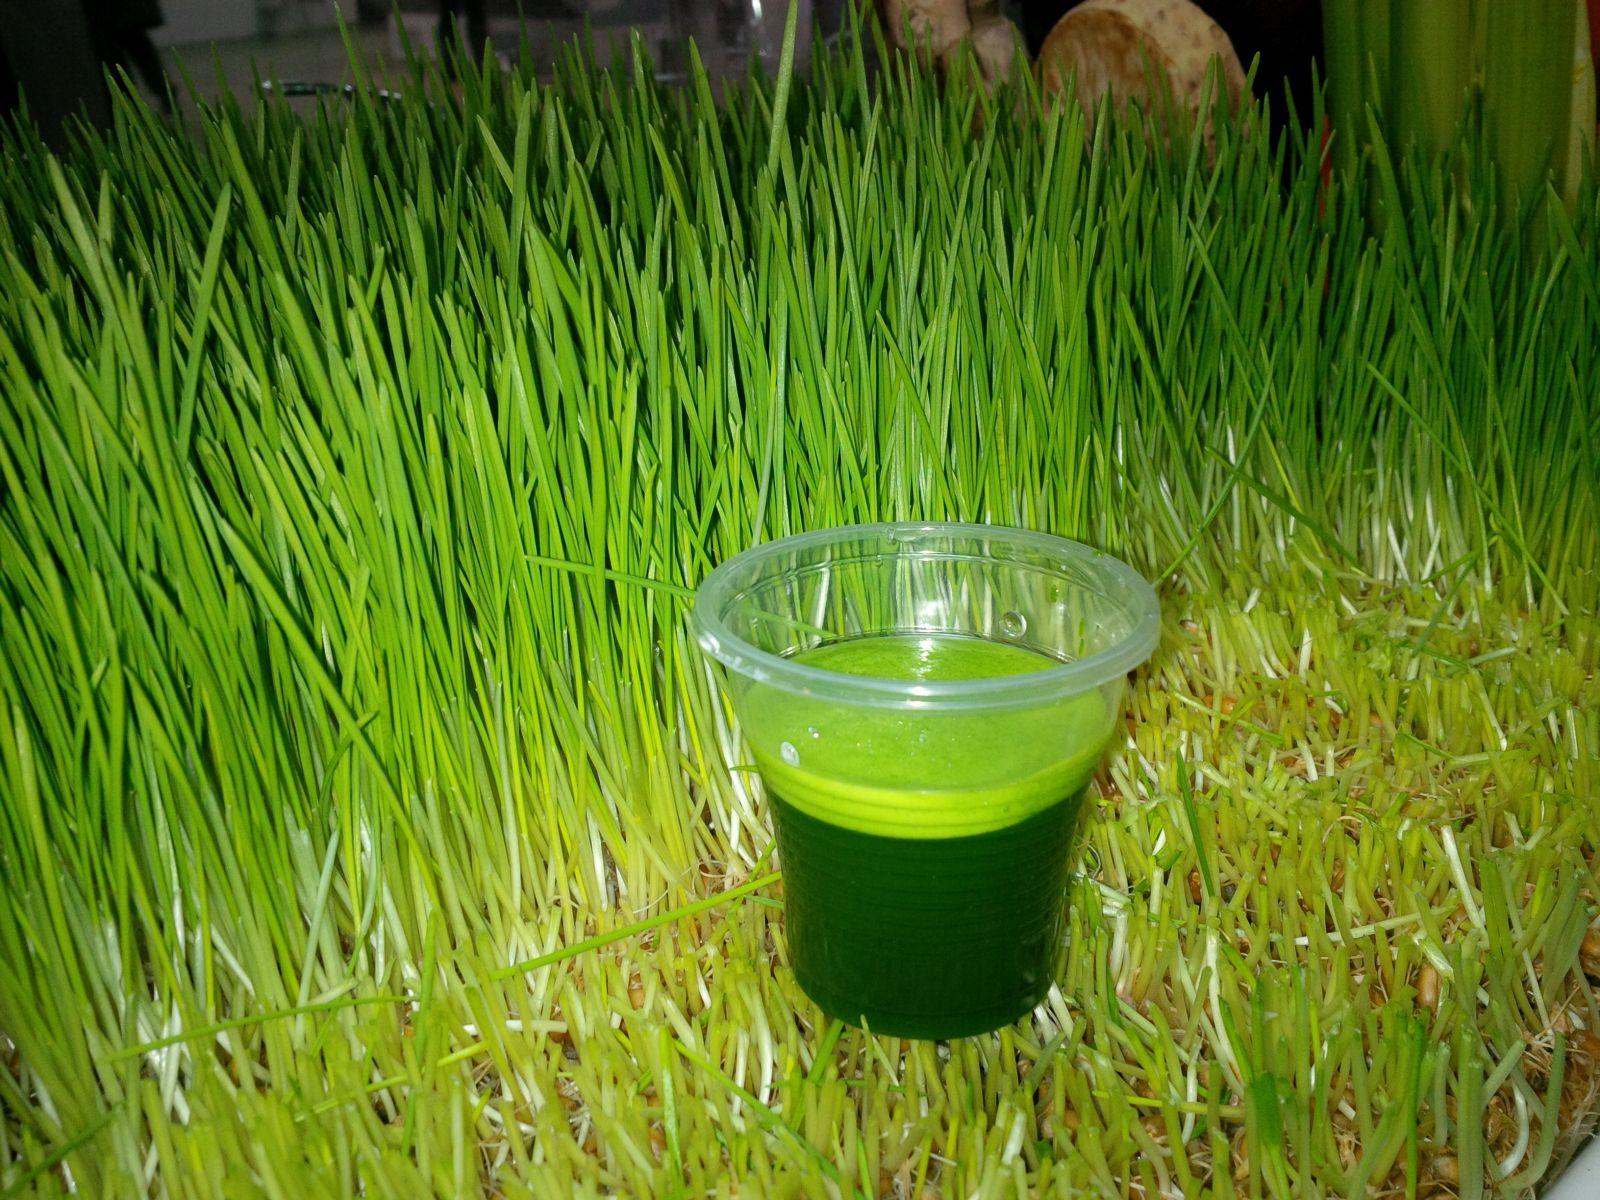 Suc natural din iarba de grau